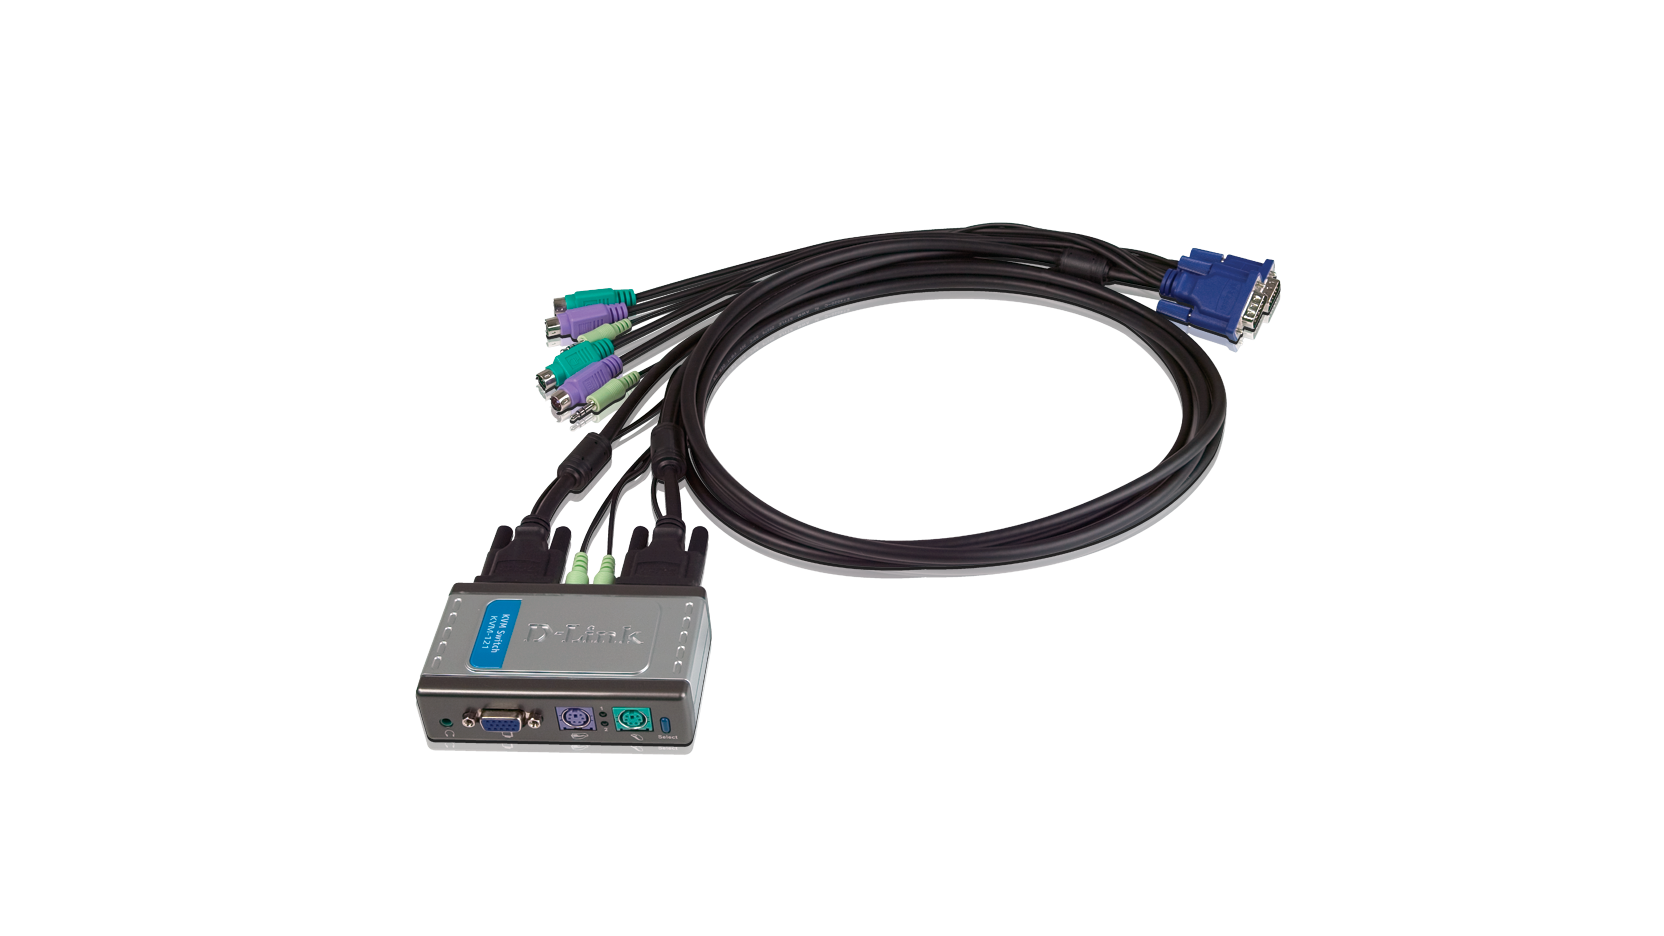 kvm 121 2 port kvm switch with audio support malaysia iogear gcs1724 4 port vga kvm